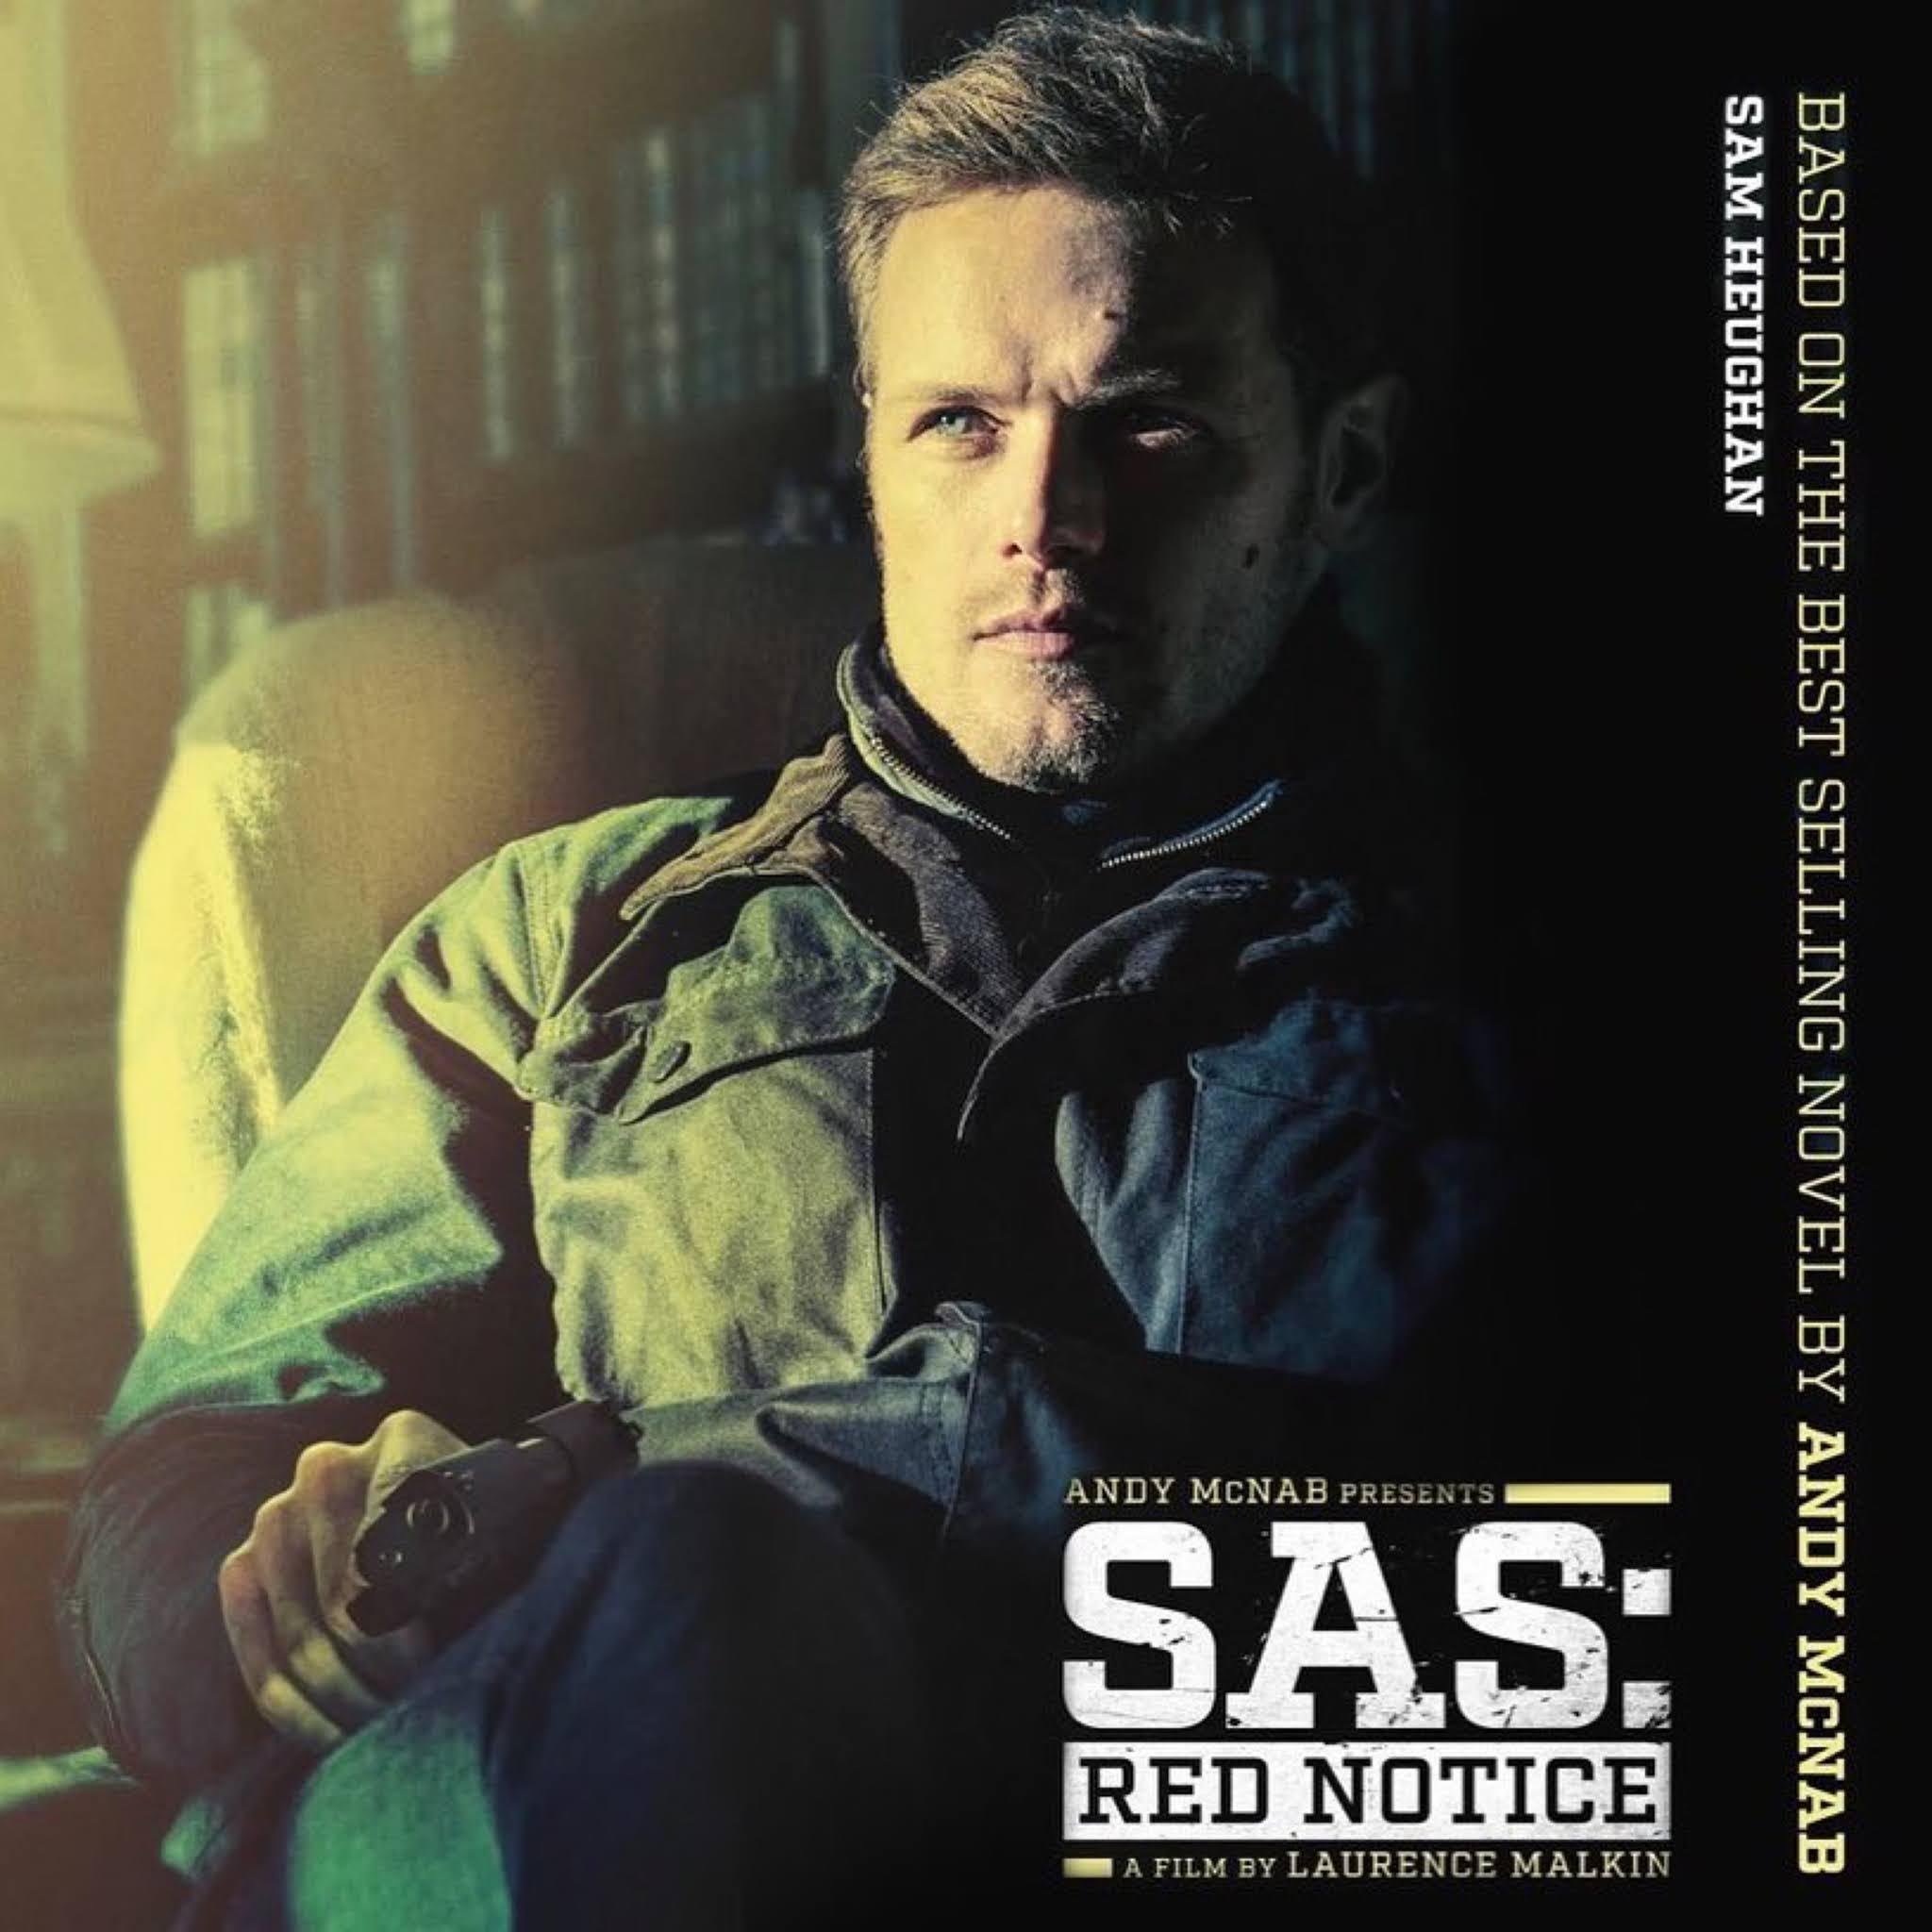 Download Filme SAS Red Notice Torrent 2021 Qualidade Hd